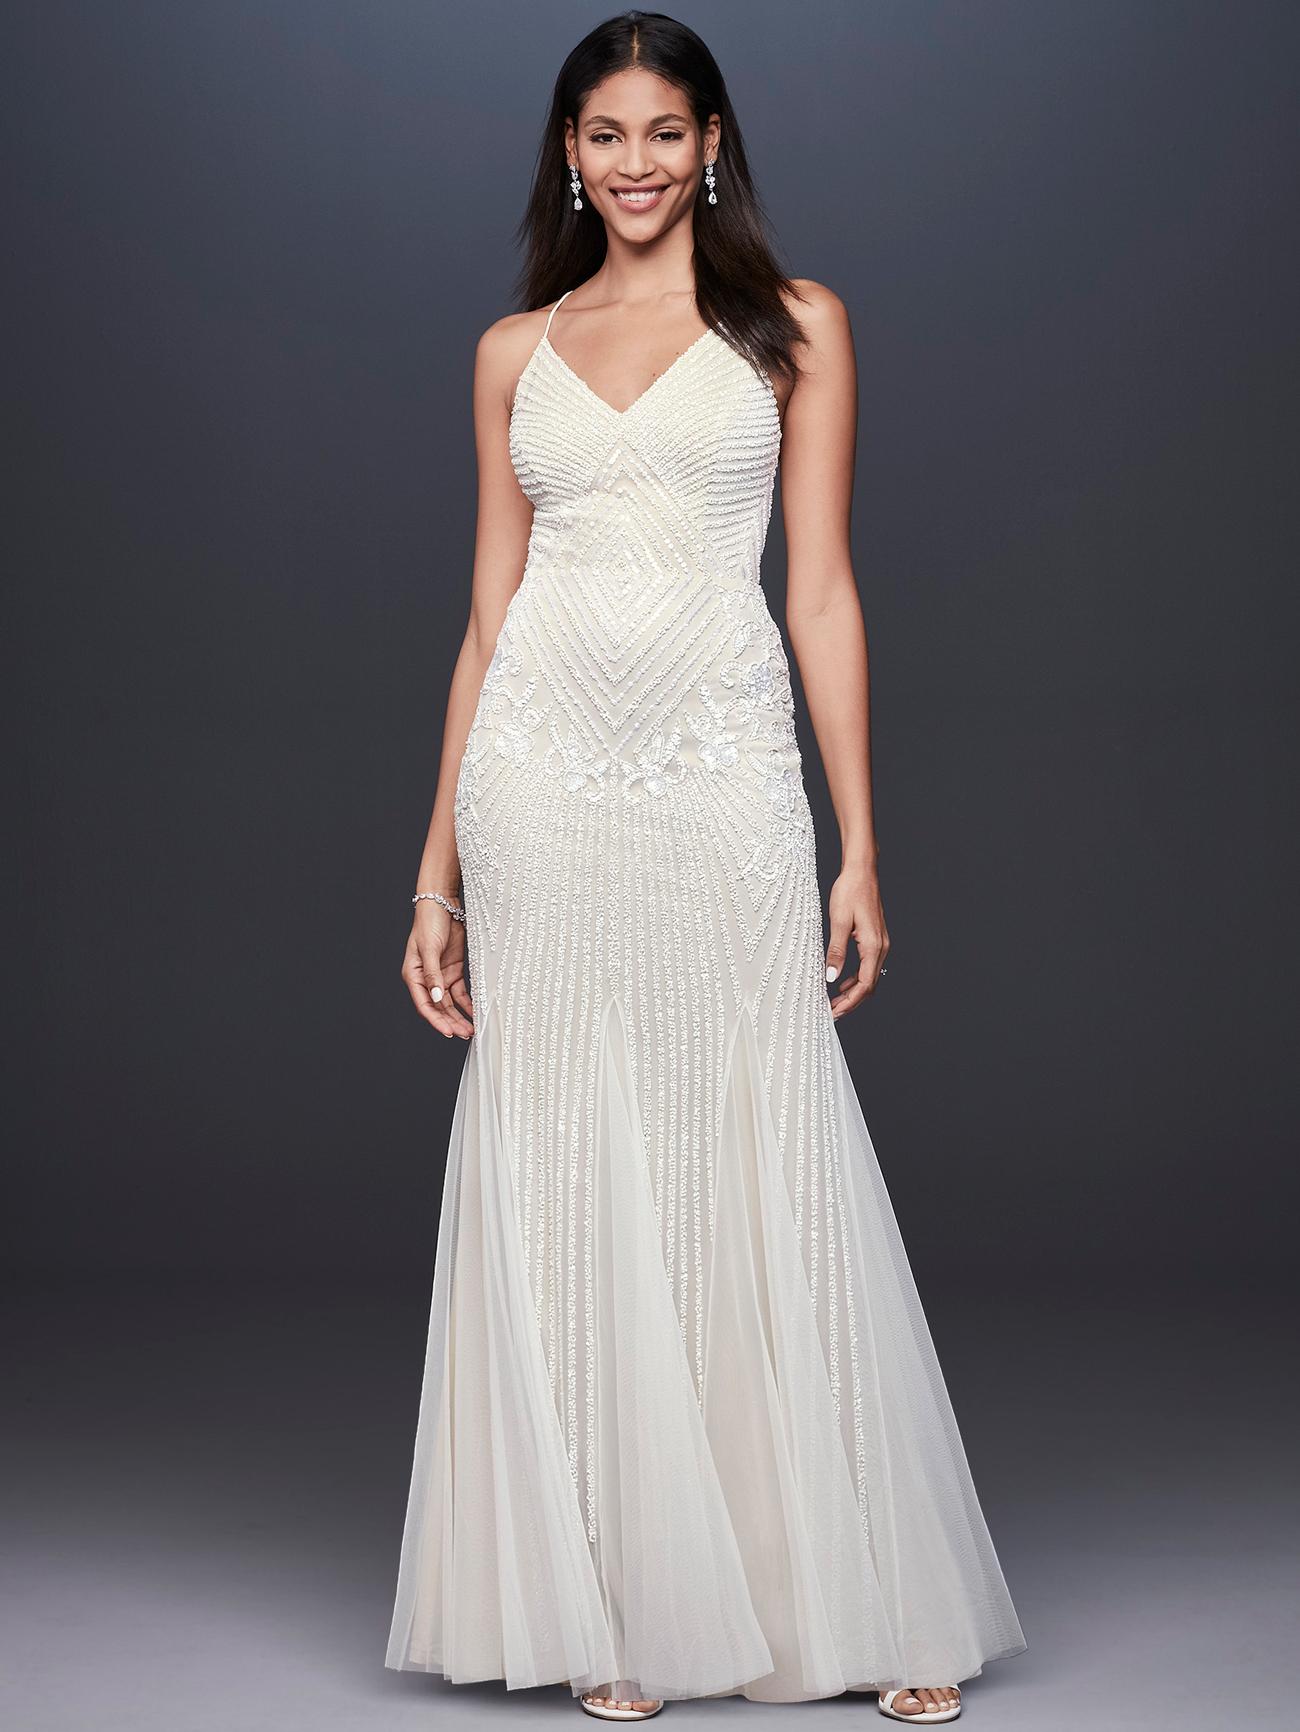 davids bridal db studio beaded v-neck wedding dress fall 2020